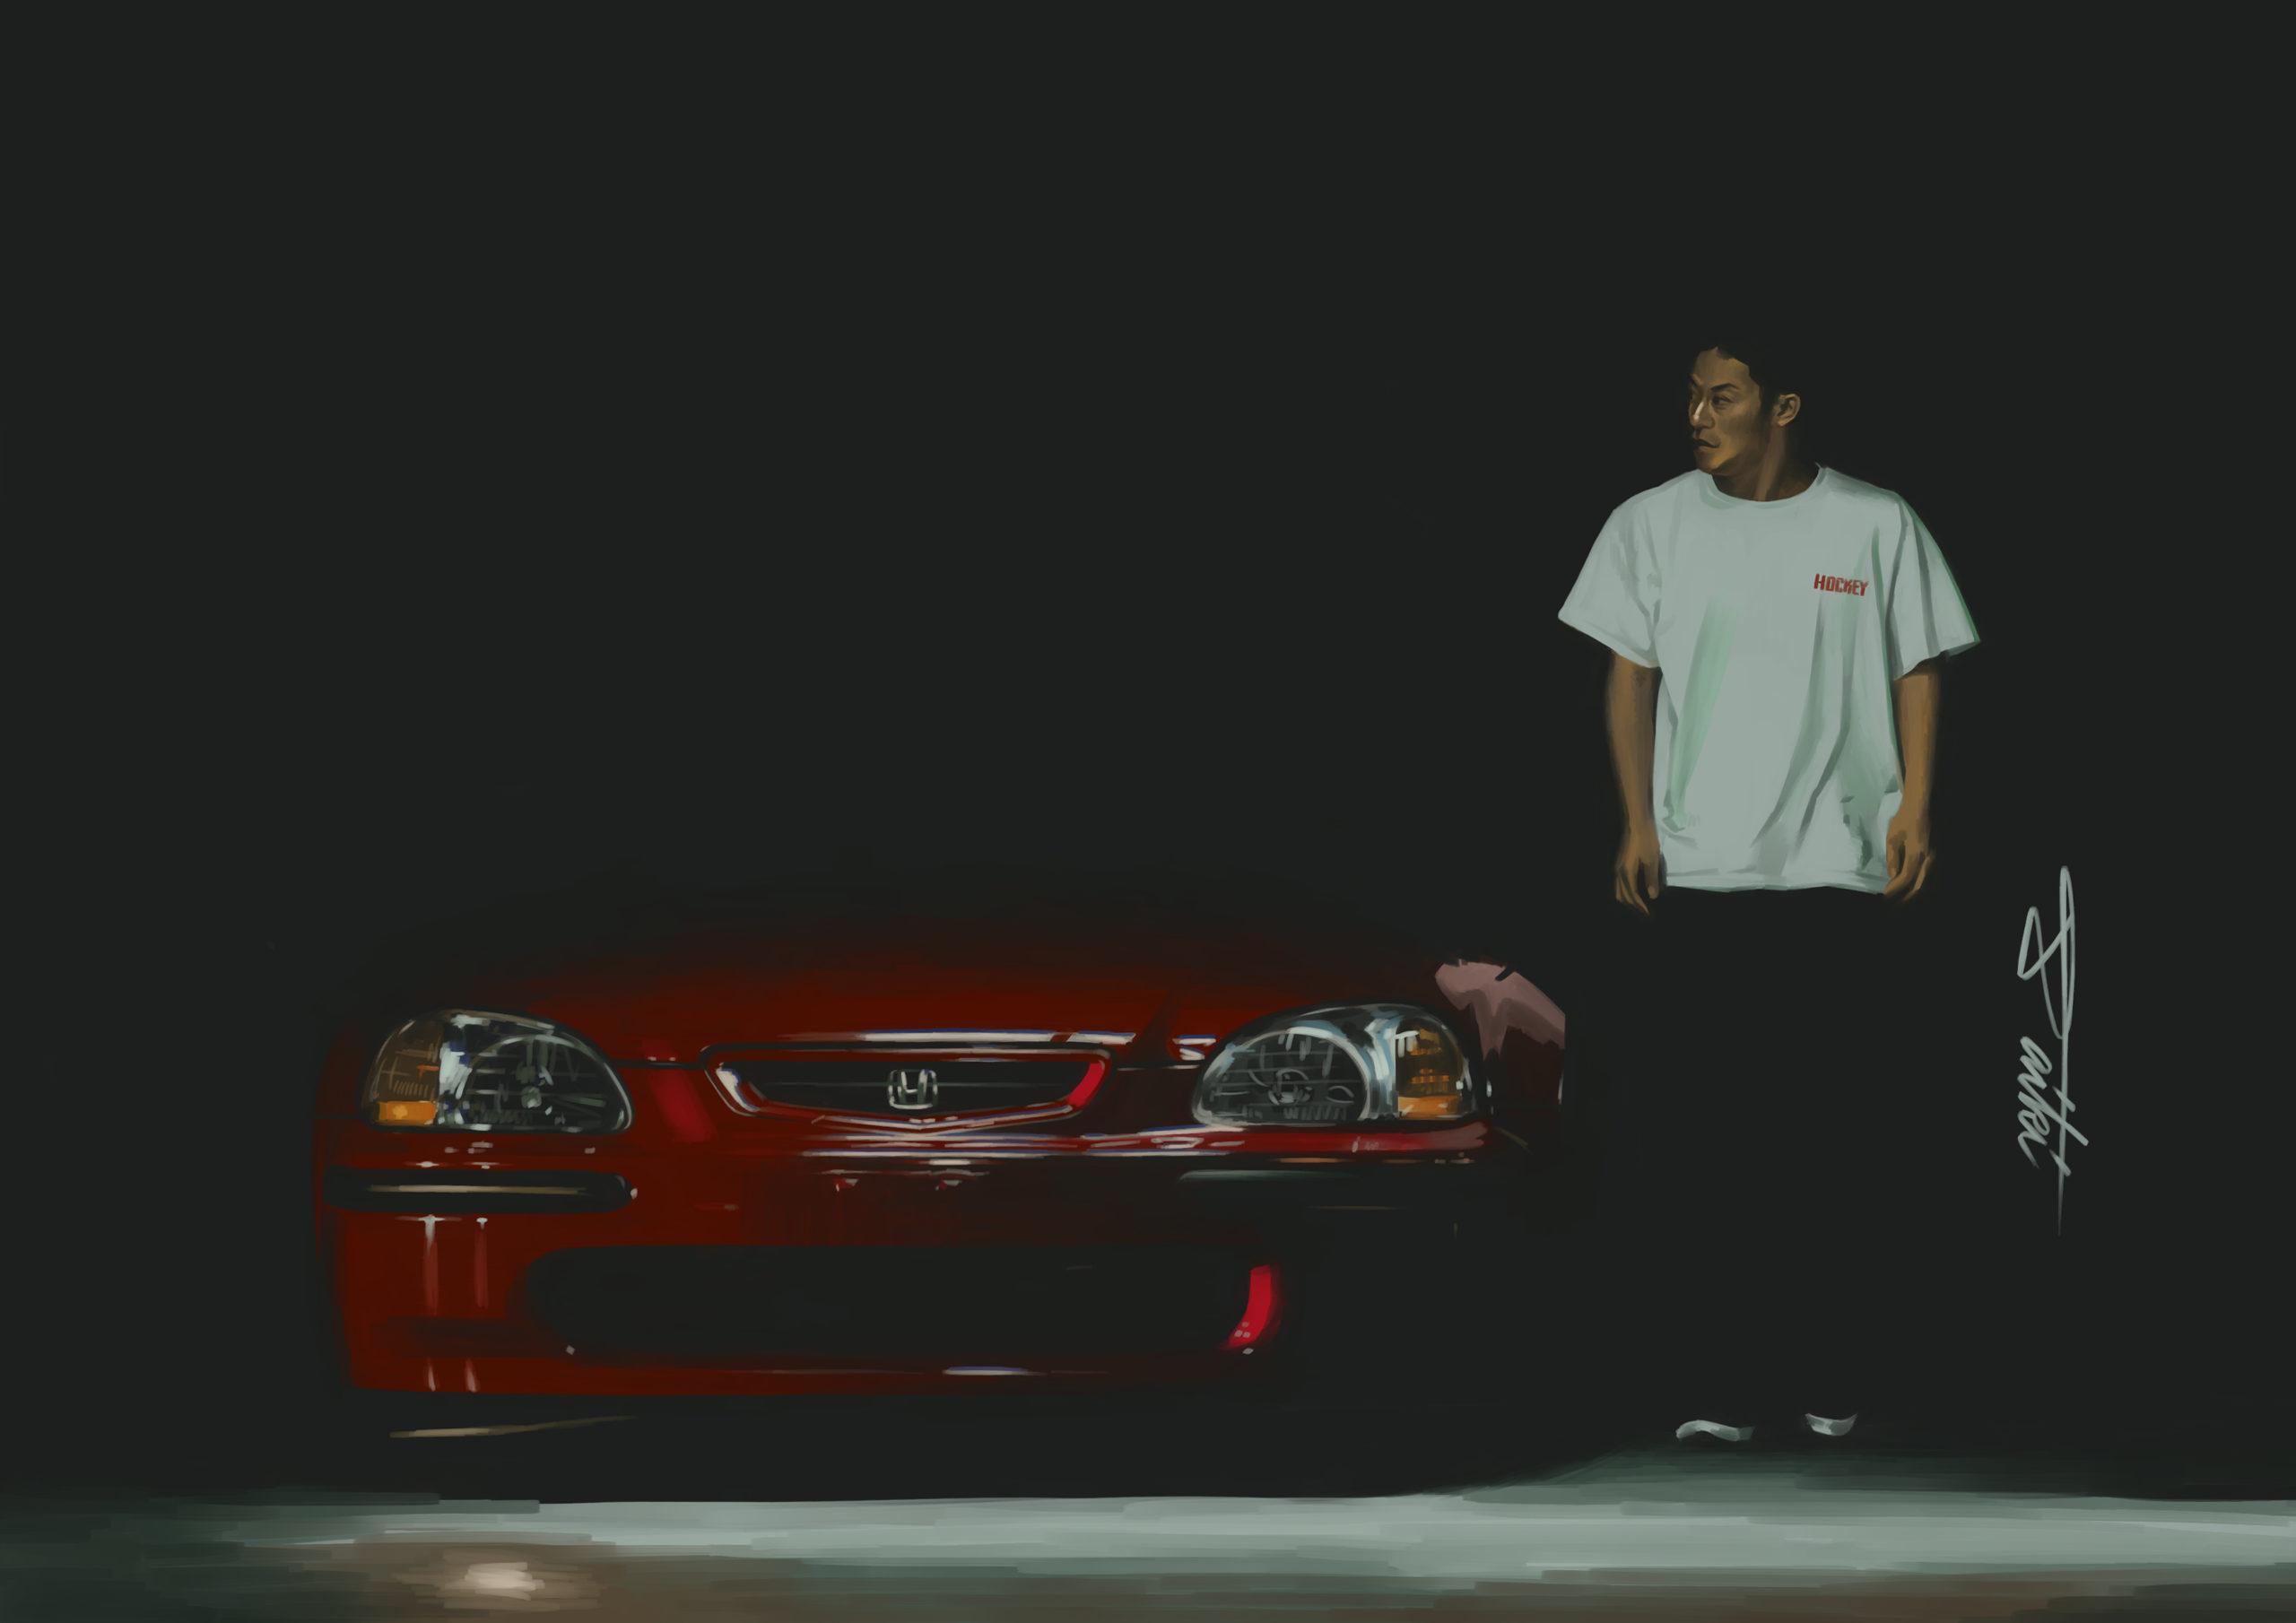 HONDA シビックek4 車イラスト